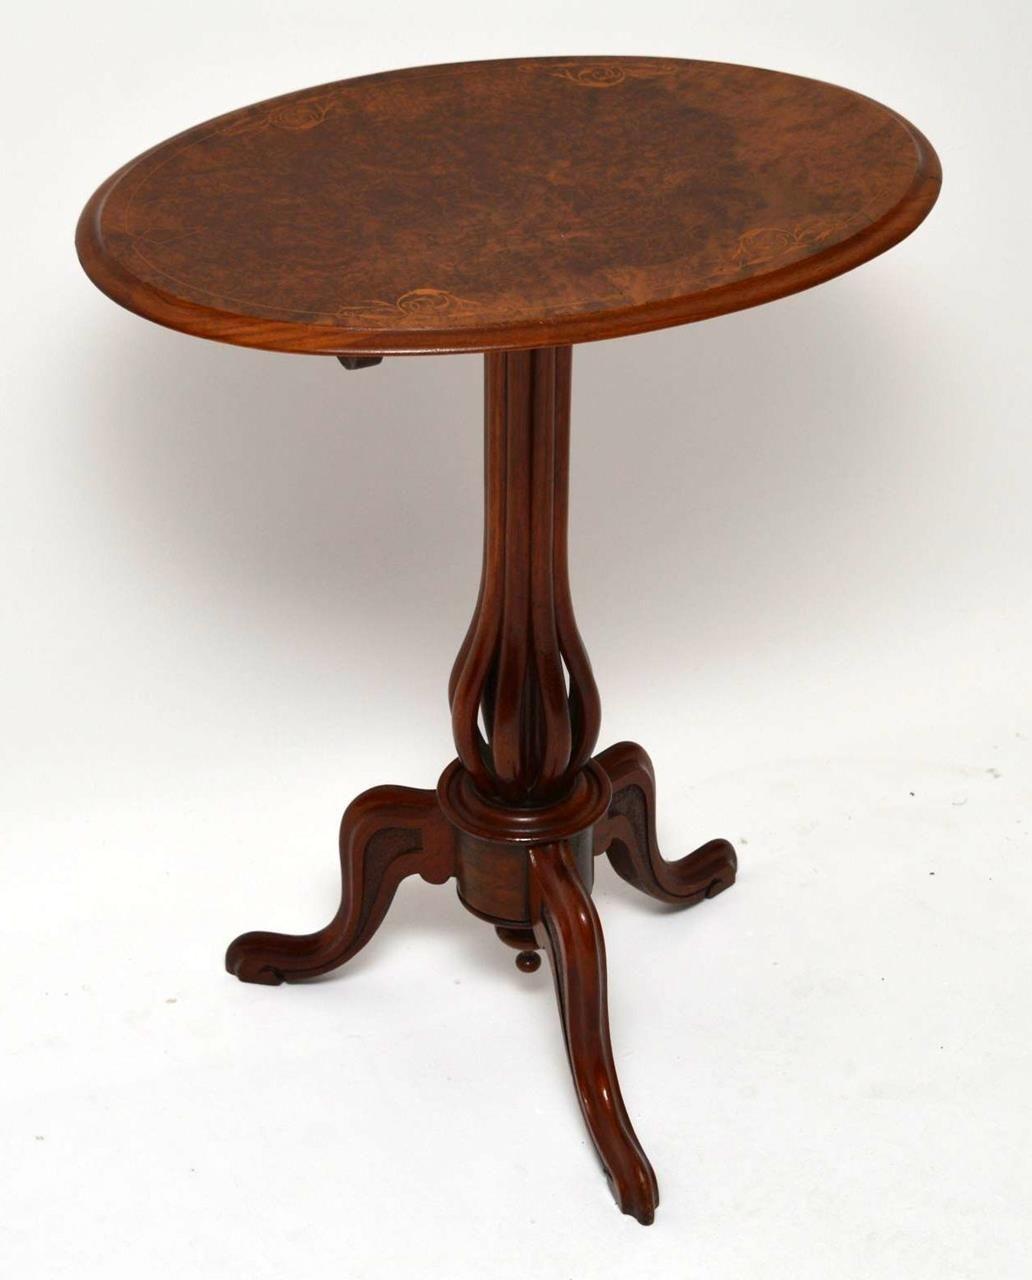 Antique Victorian Burr Walnut Tilt Top Table Small Antique Victorian Oval Tilt Top Table With A F Danish Furniture Mid Century Modern Furniture Retro Furniture